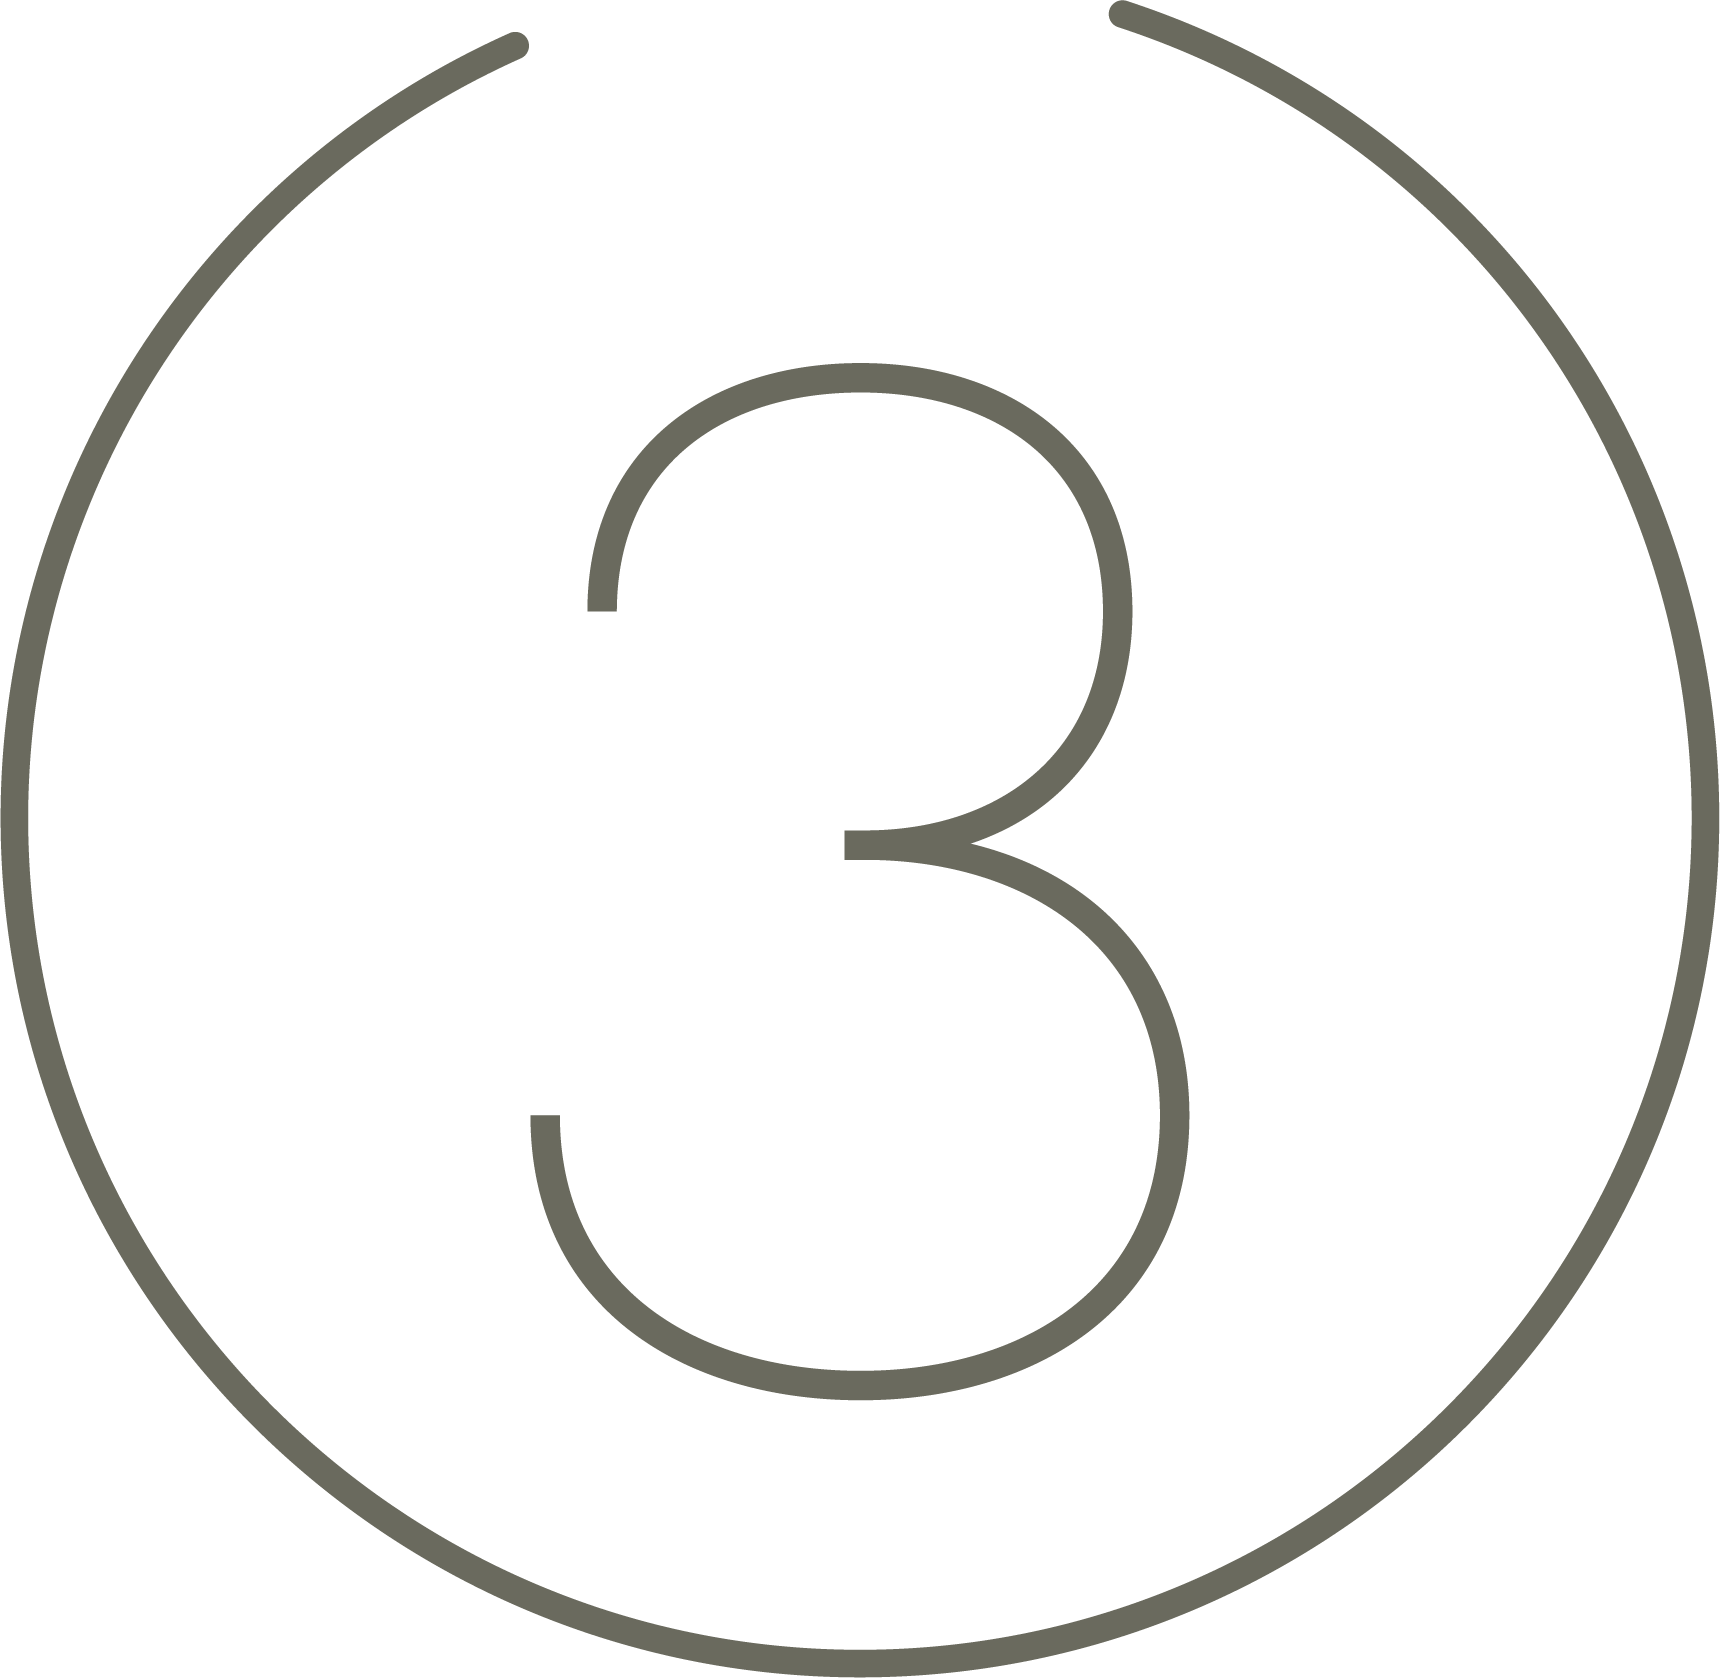 CohoDigital_ONLE_Number_3_Brown.png